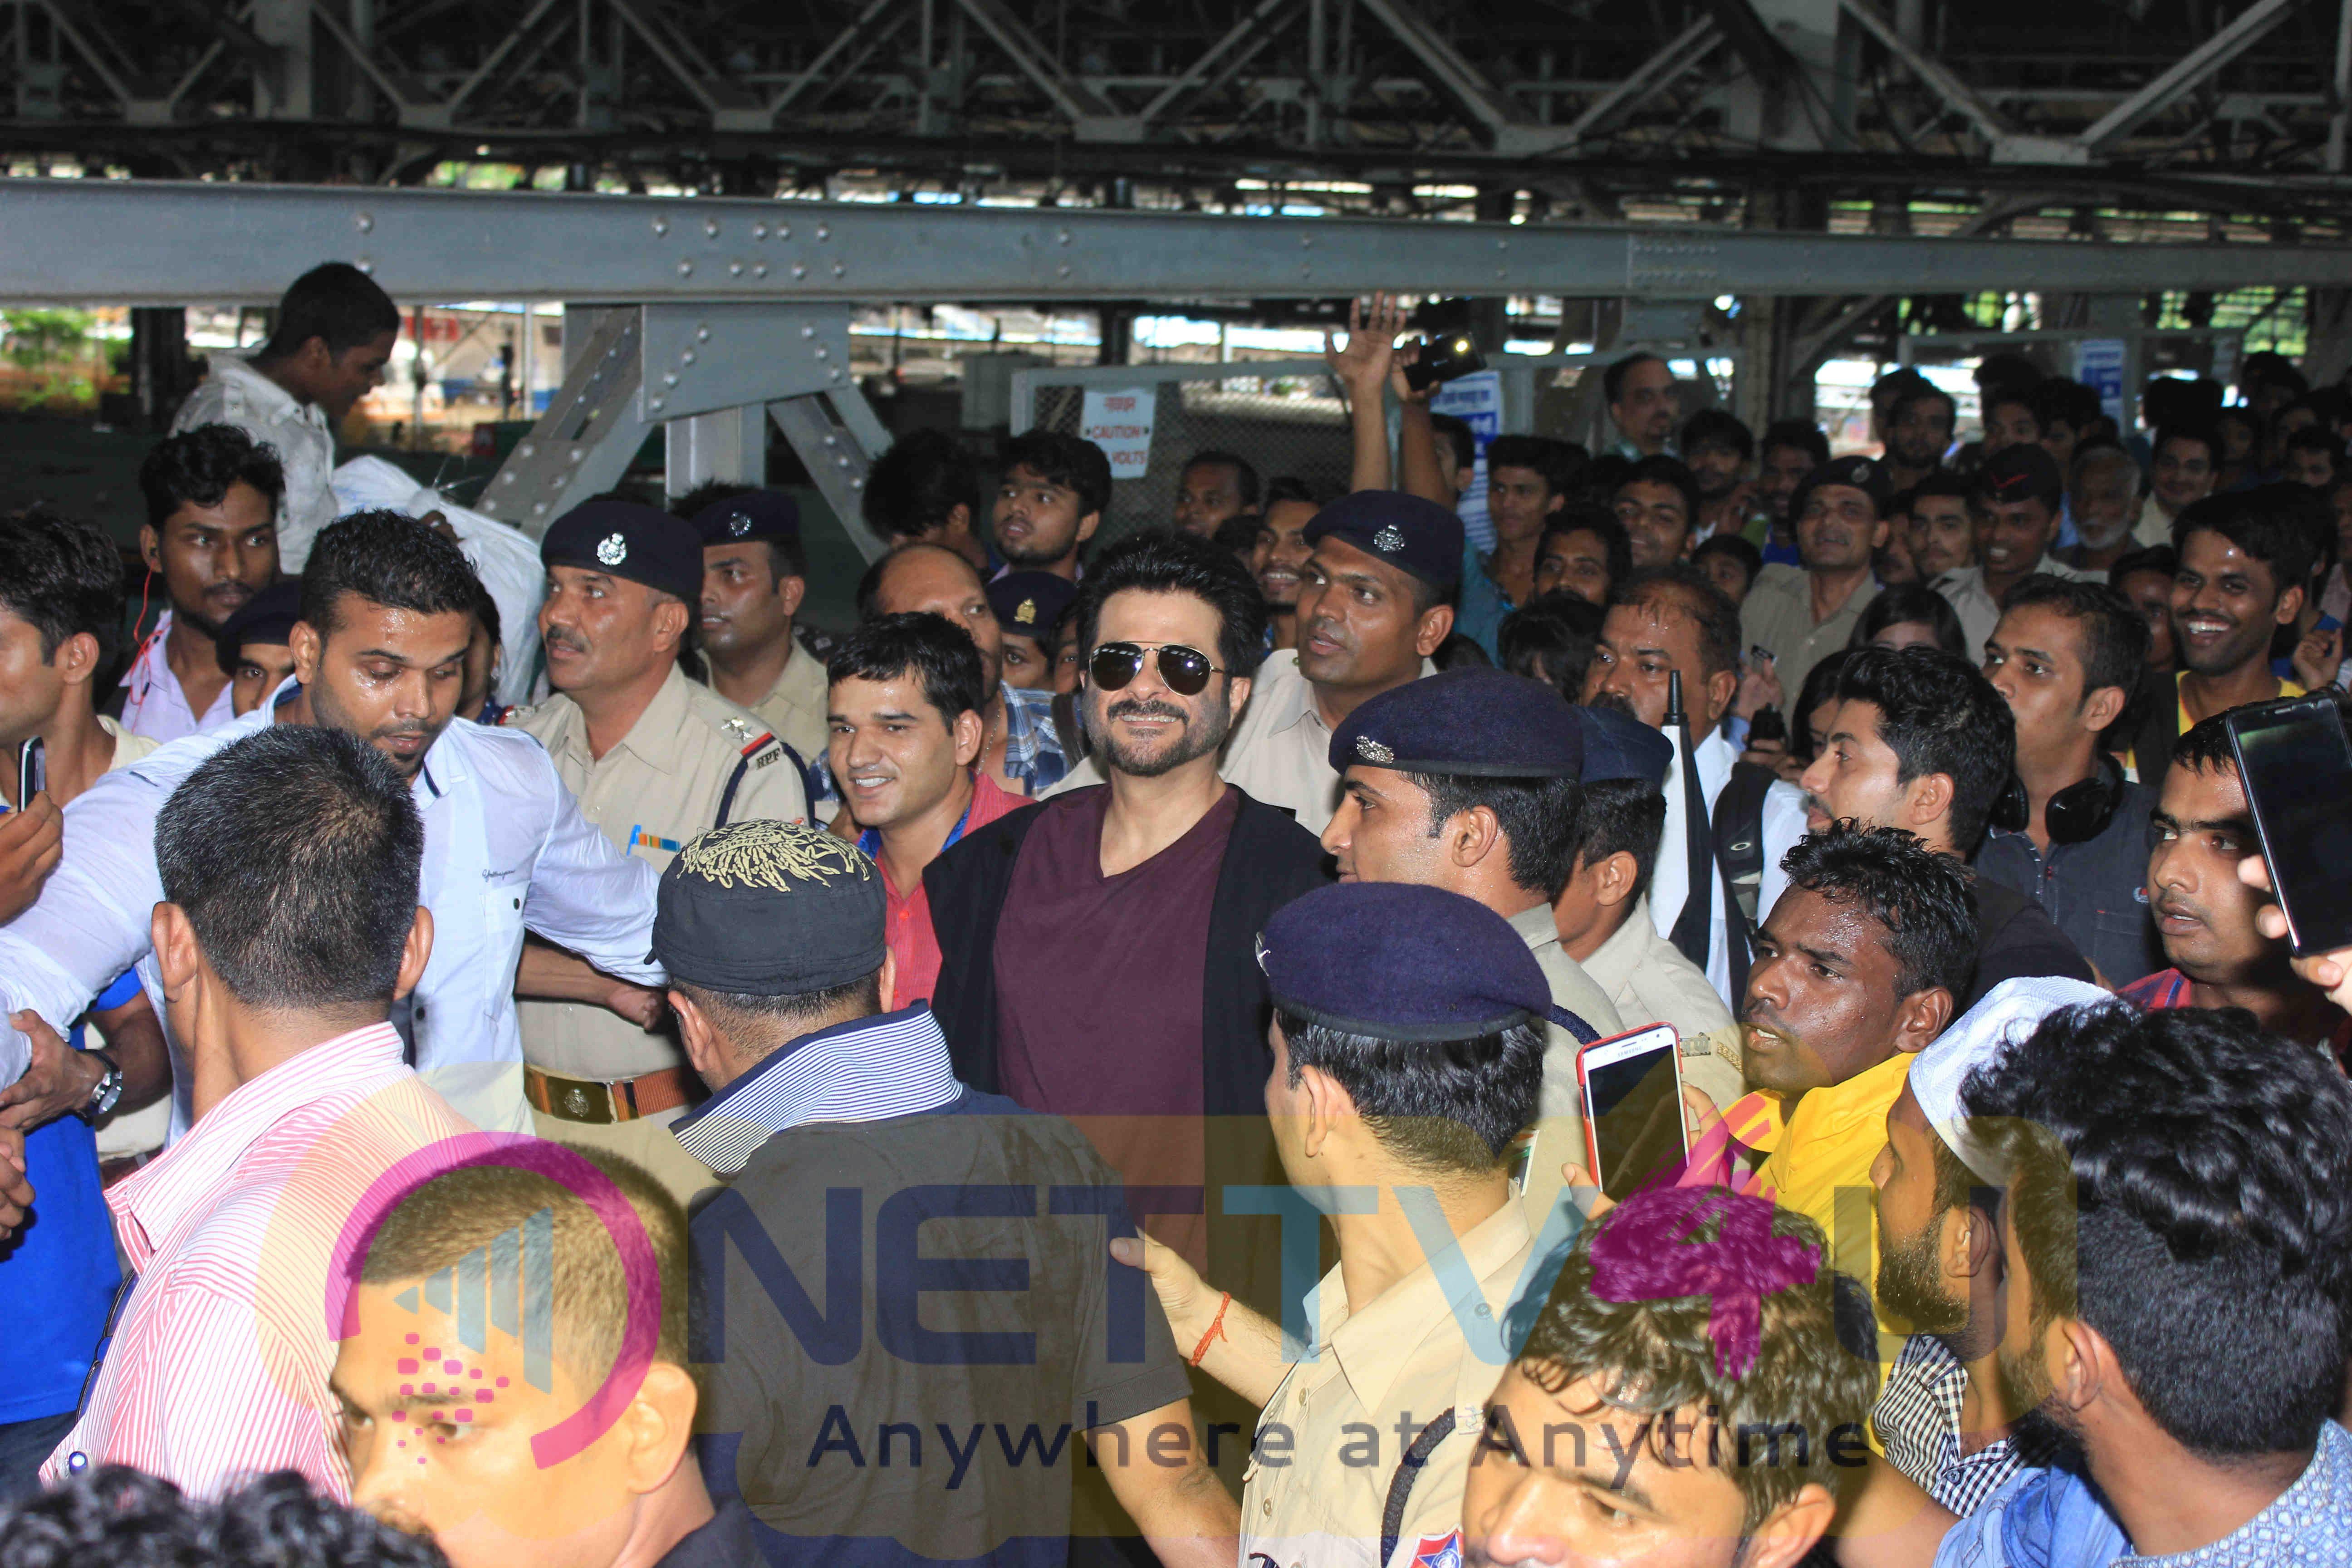 Anil Kapoor At Promotes His TV Show 24 Season 2 At Mumbai Central Station Attractive Stills